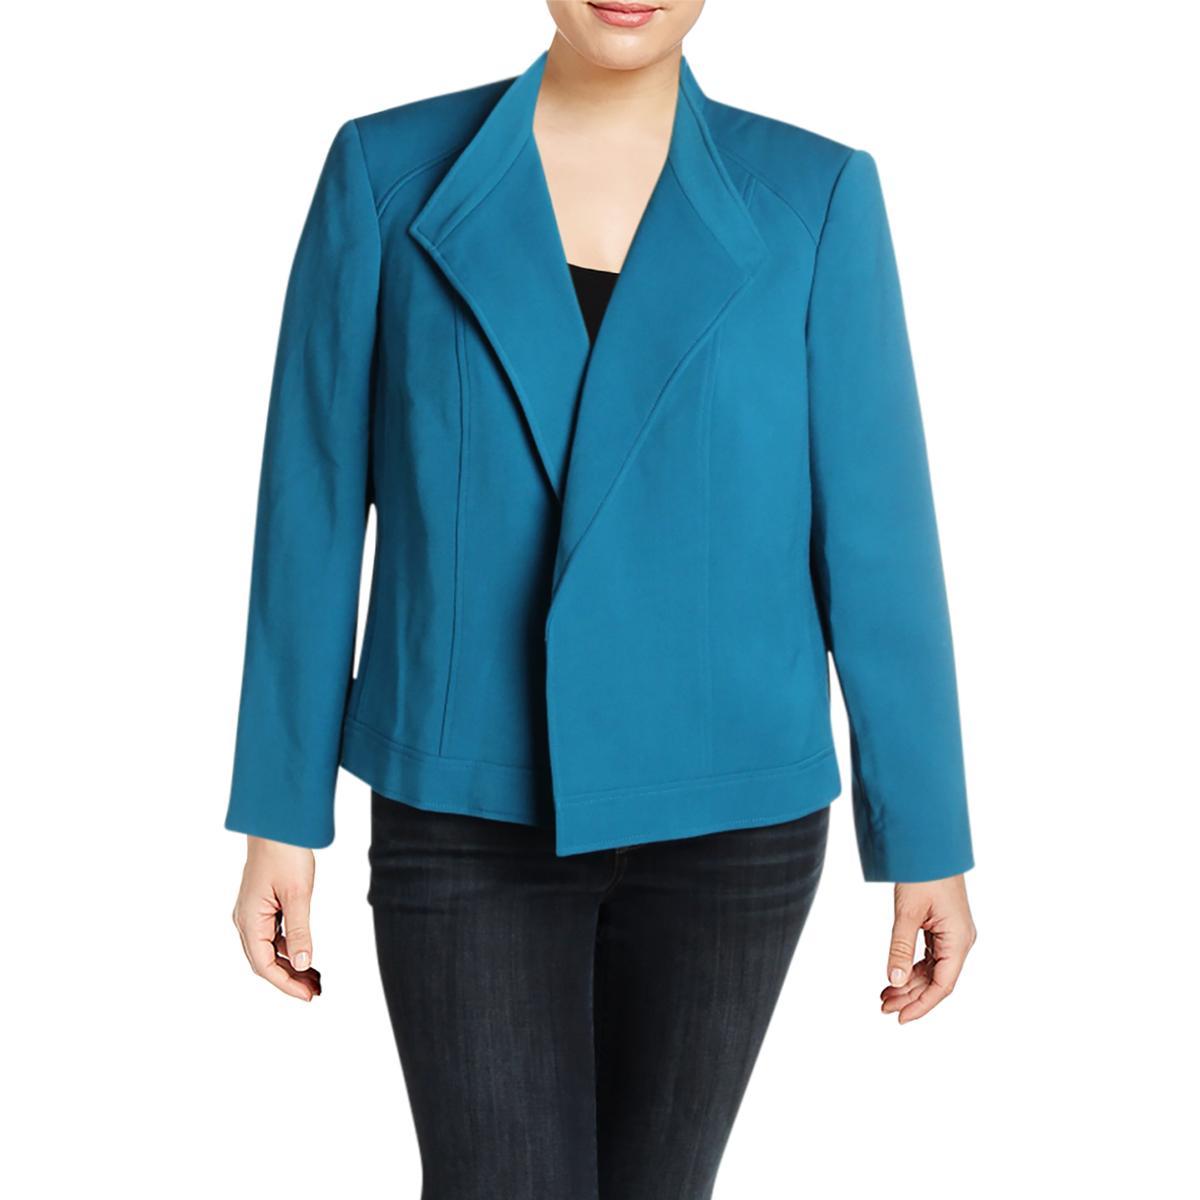 cff00d7304e Details about Tahari ASL Womens Blue Wear to Work Dressy Suit Jacket Blazer  Plus 20W BHFO 7251